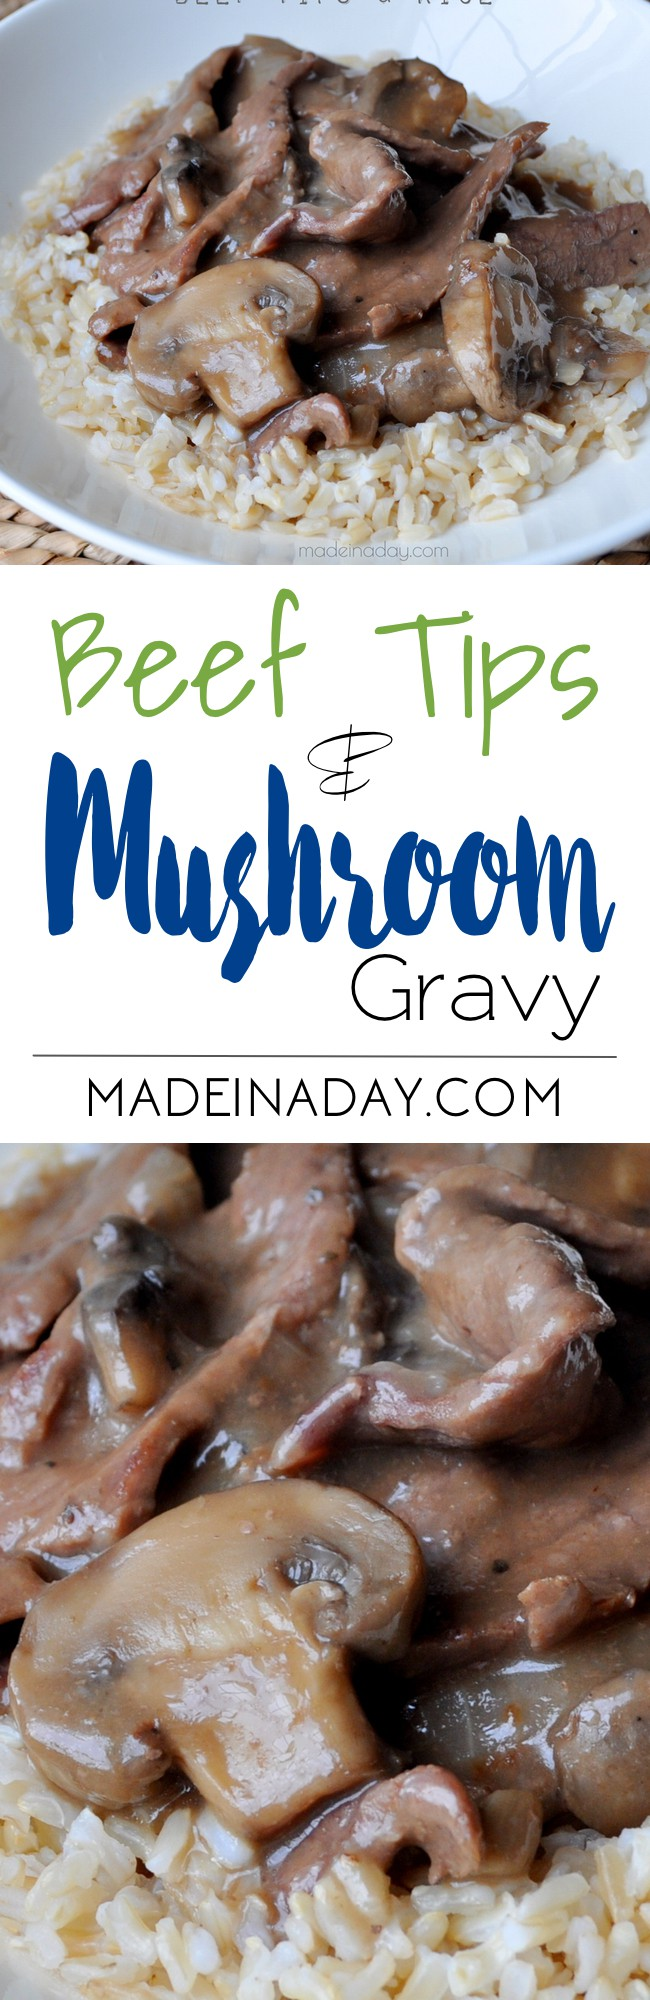 Beef Tips & Mushroom Gravy Recipe, Tender beef tips smothered mushroom gravy. Great Southern comfort food recipe, easy family meal, beef gravy, mushroom gravy, beef